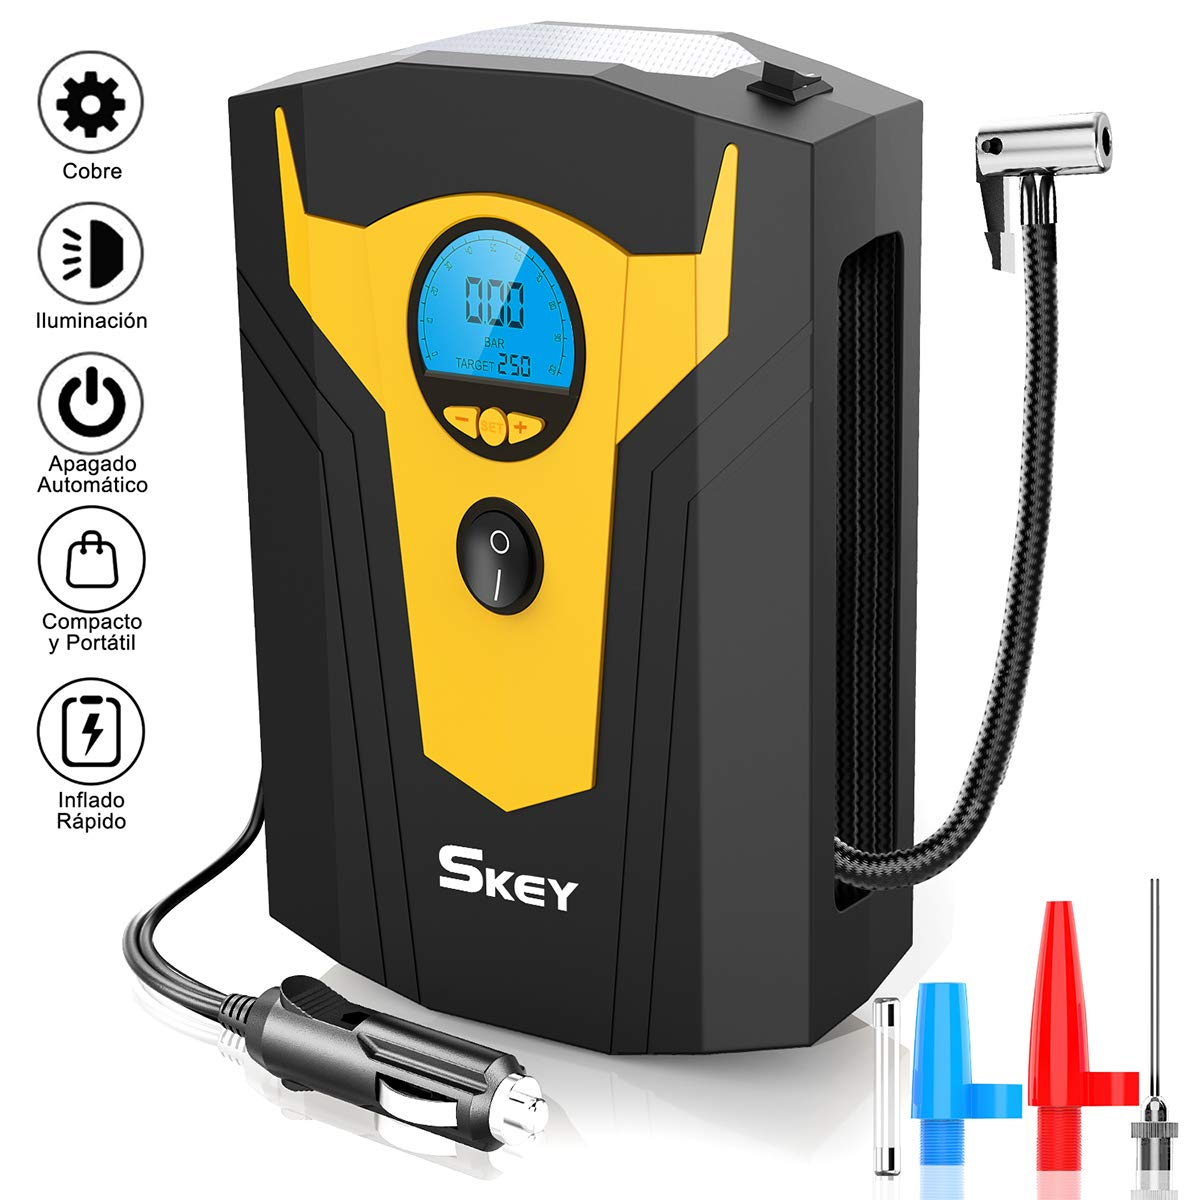 SKEY Compresor de Aire Coche Portatil Bomba Inflador 12v con LED Pantalla Digital LCD para Hinchar Neumáticos de Moto Coche y Bicicleta product image